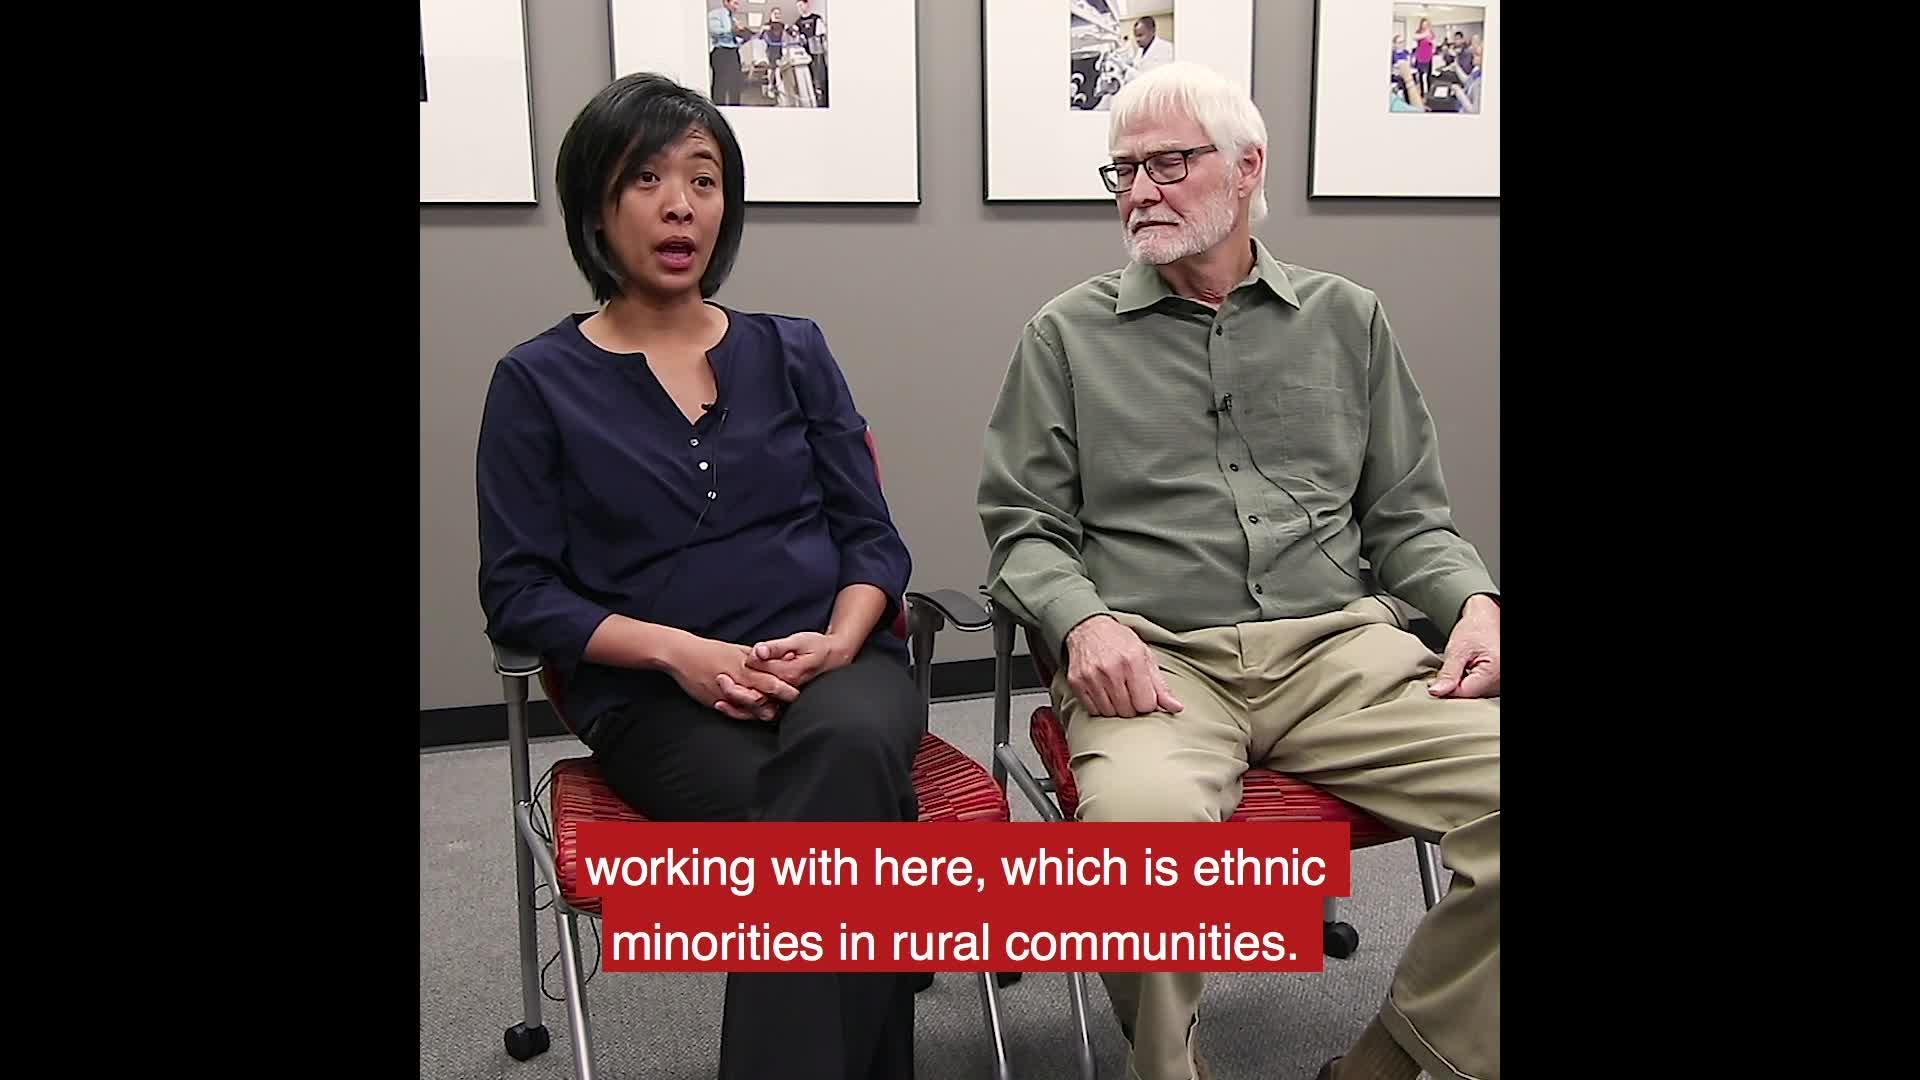 Study aims to enhance quality of life for rural Nebraska minorities, communities